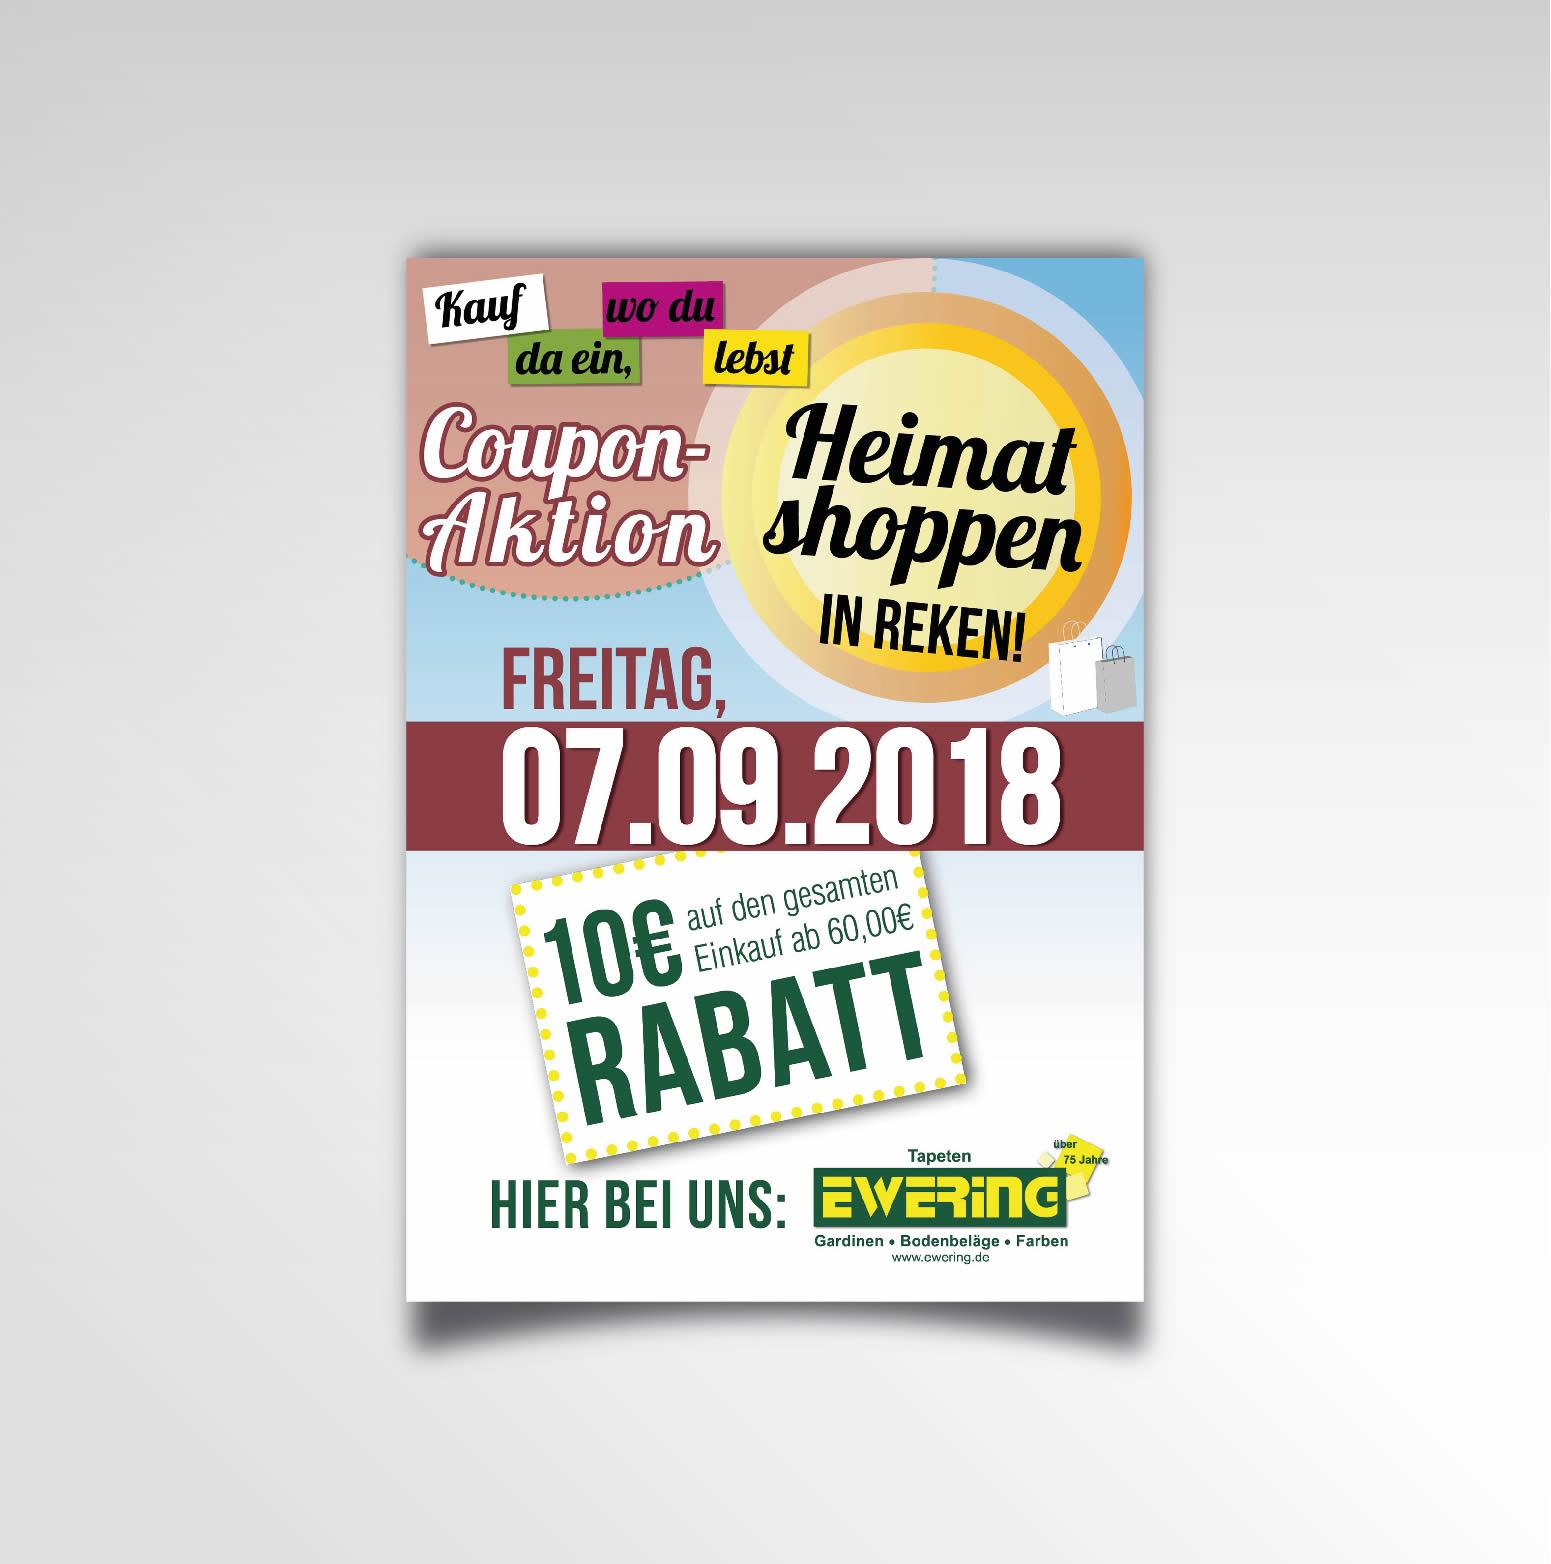 Heimatshoppen Plakat Ewering Raumdesign Rabattaktion Printprodukt